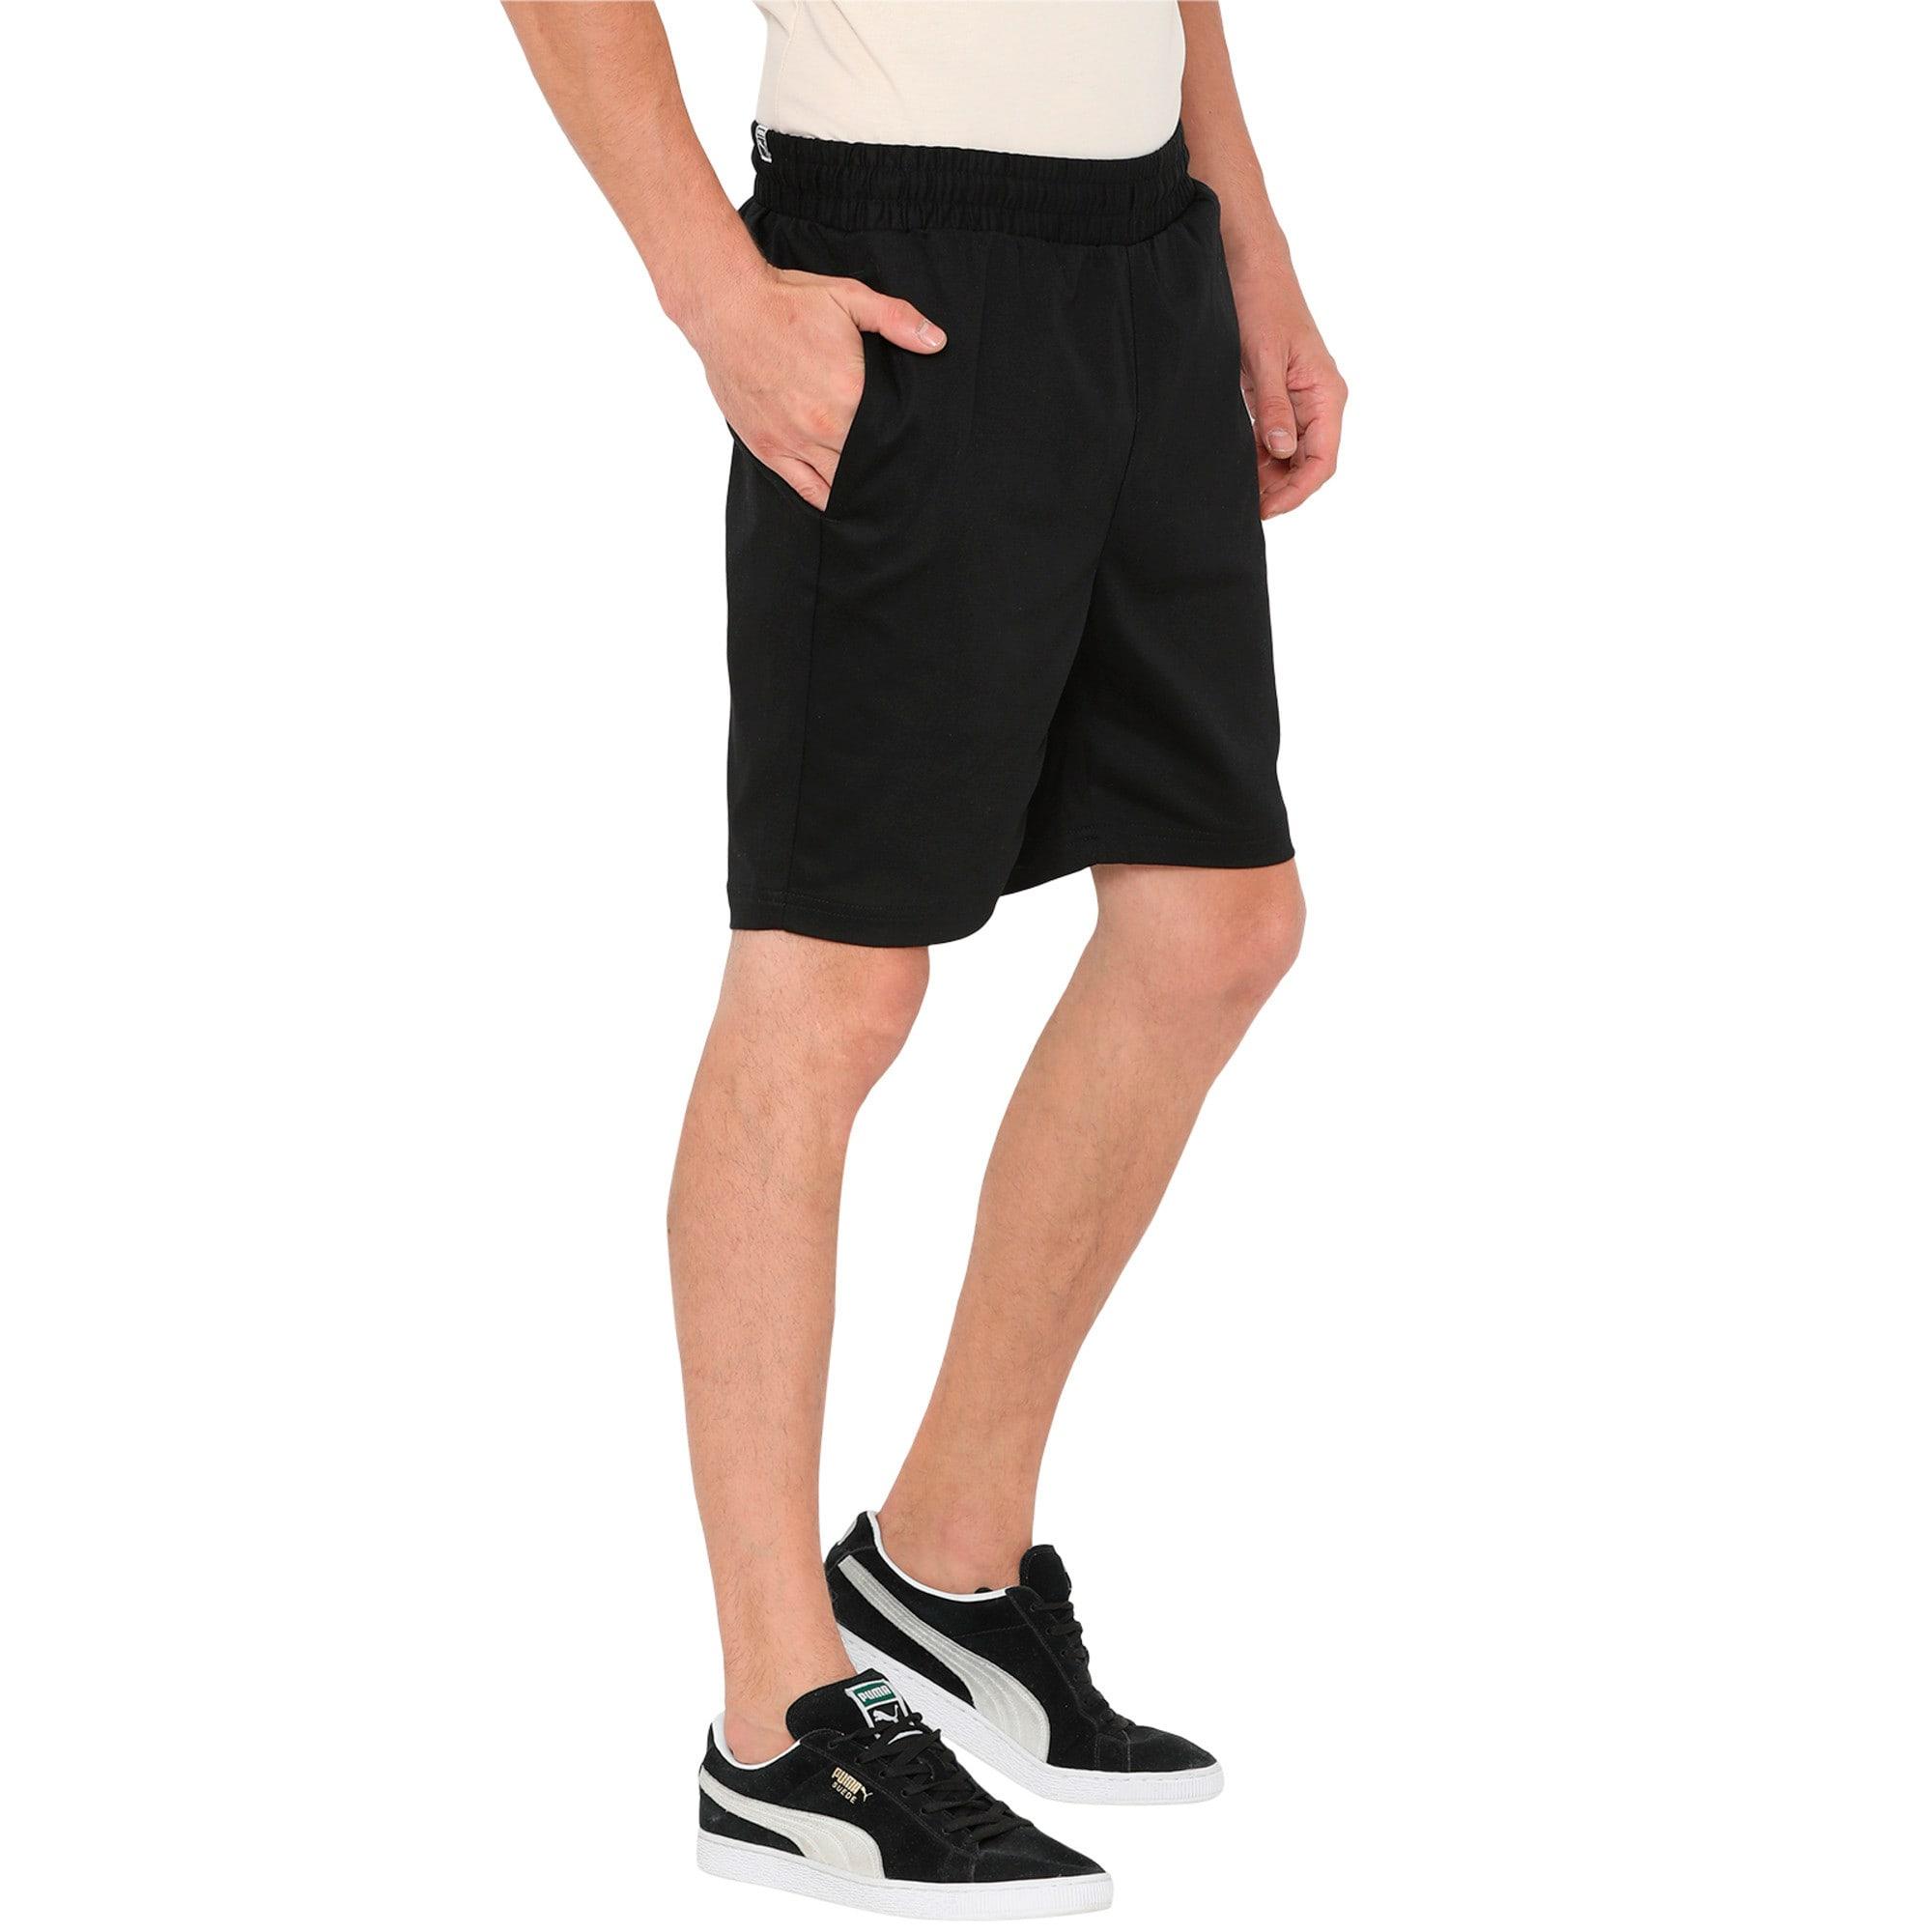 Thumbnail 1 of Men's Suede Shorts, Puma Black, medium-IND